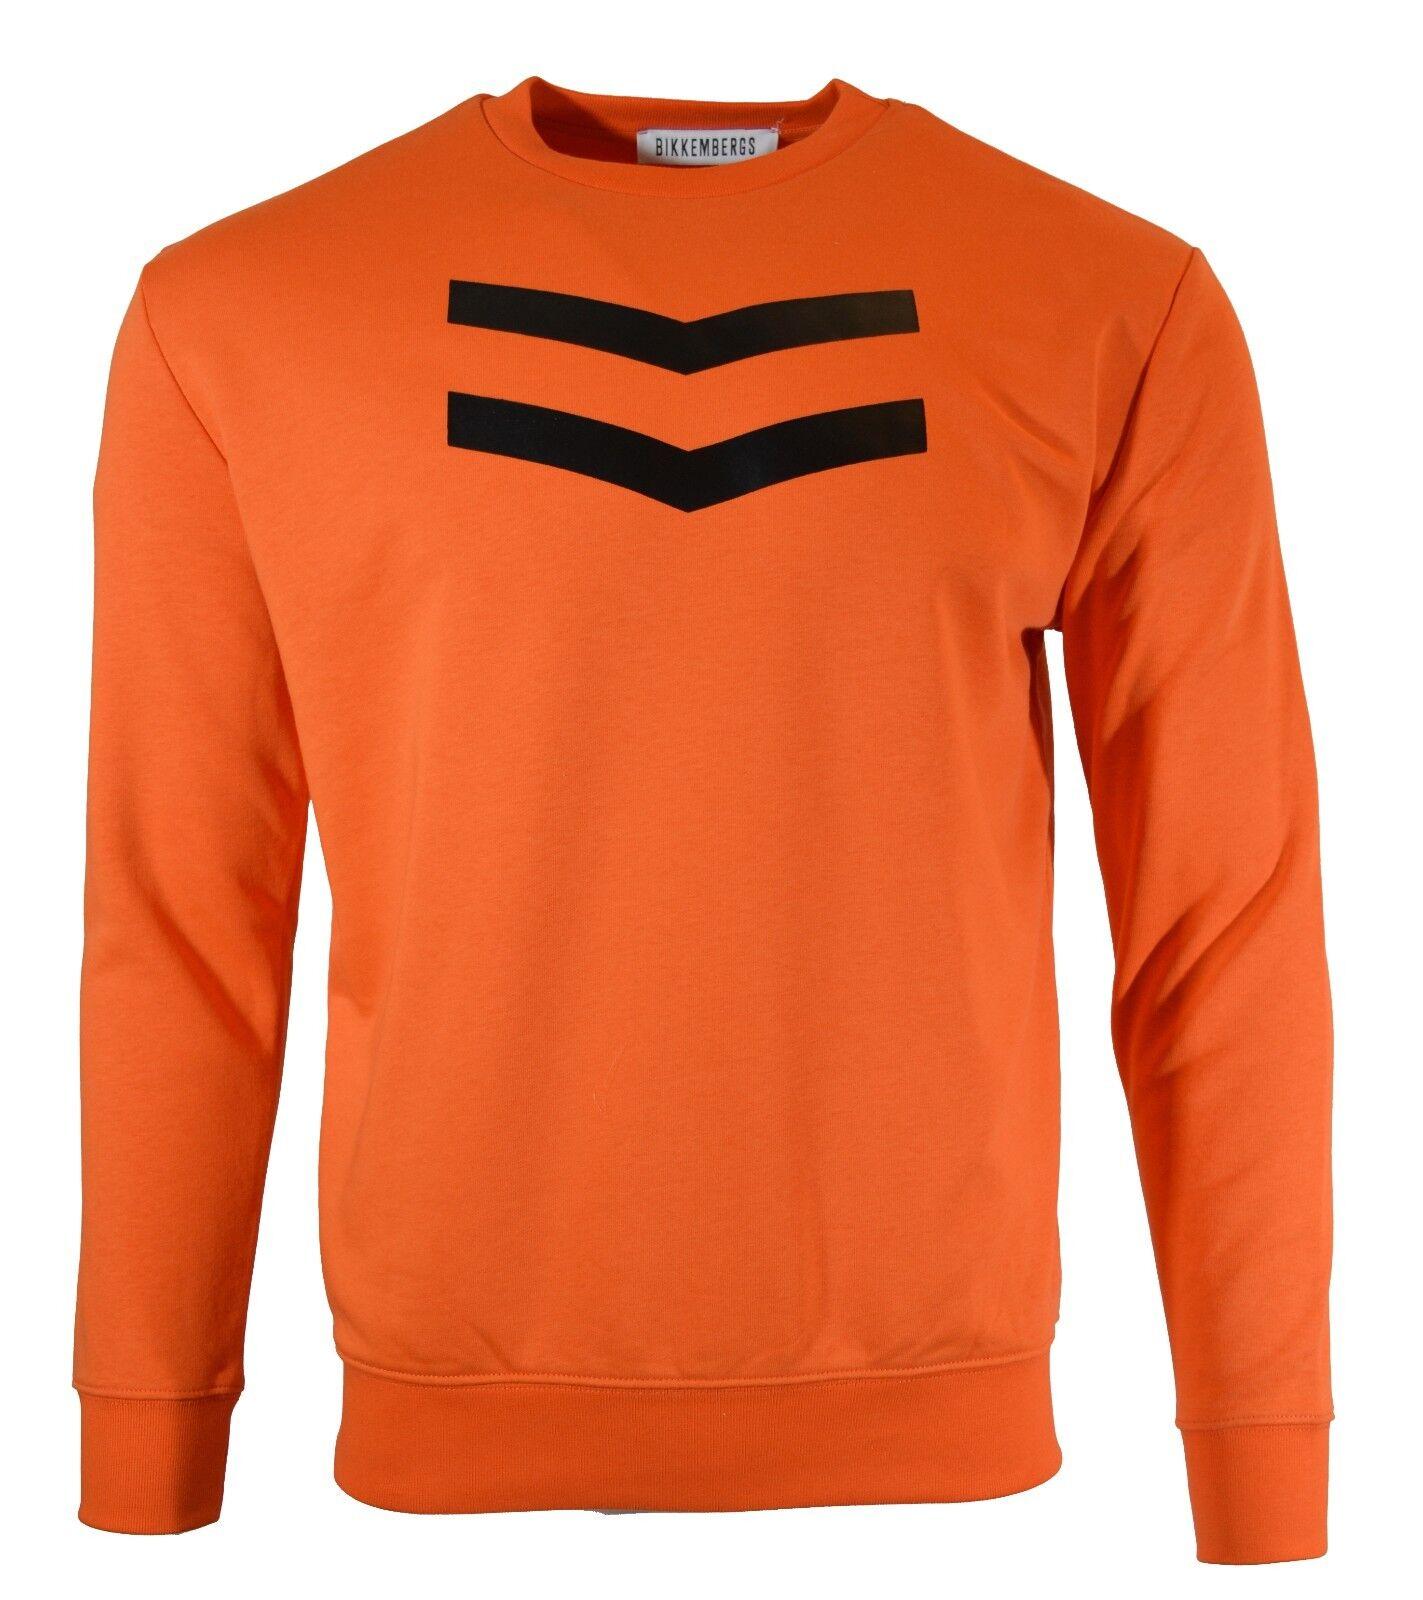 50% OFF | BIKKEMBERGS SWEATSHIRT CHEVRON LOGO TOP Orange C600201M3809K12 RARE